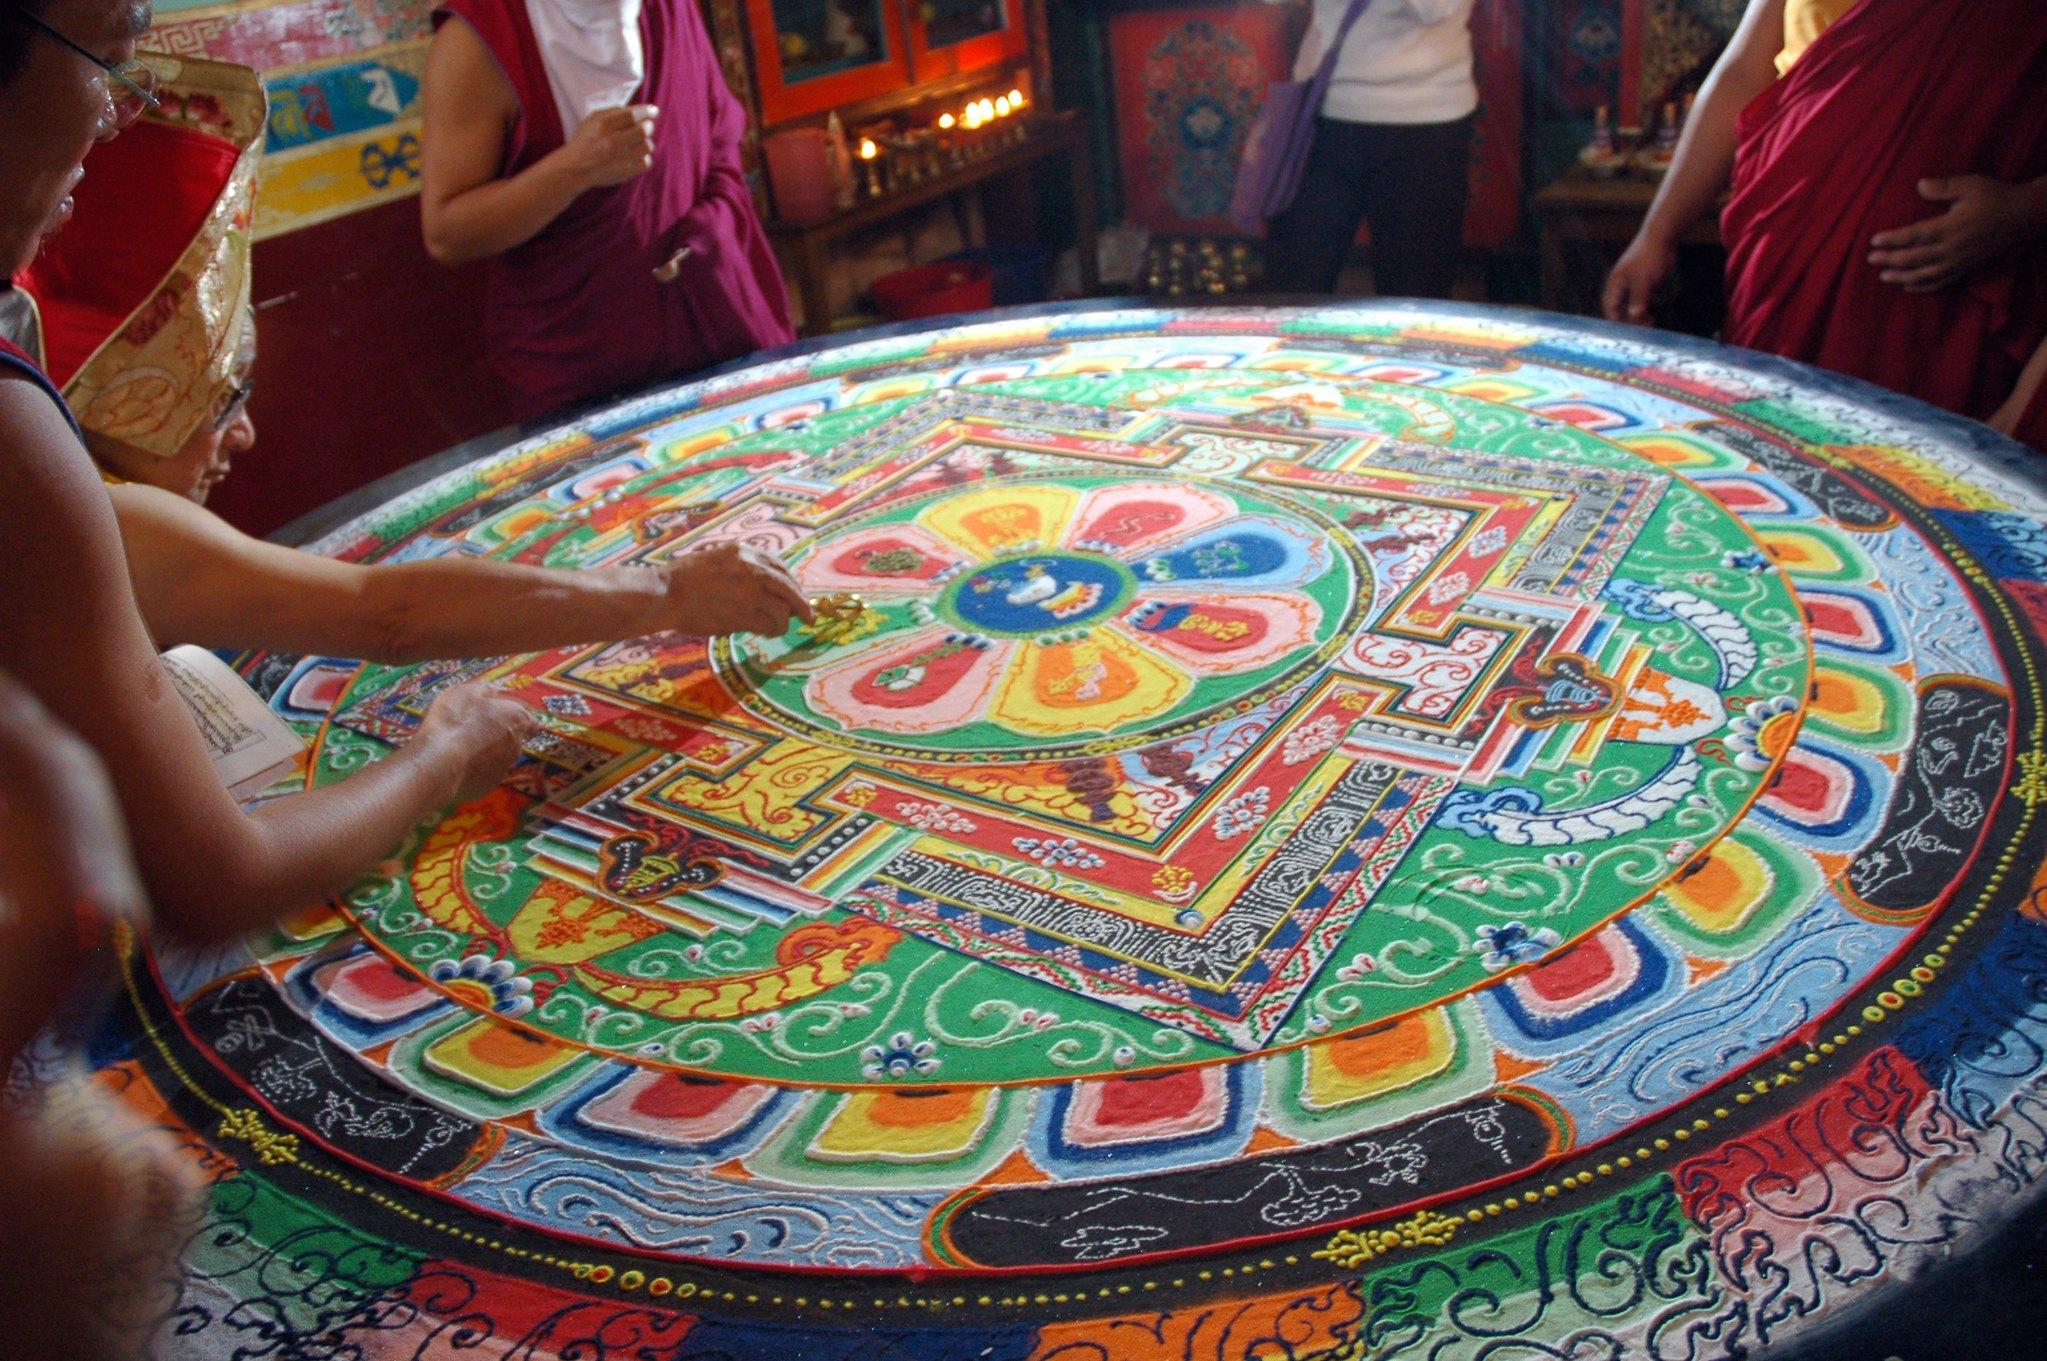 A Buddhist sand mandala. Photo: Wonderlane/Flickr